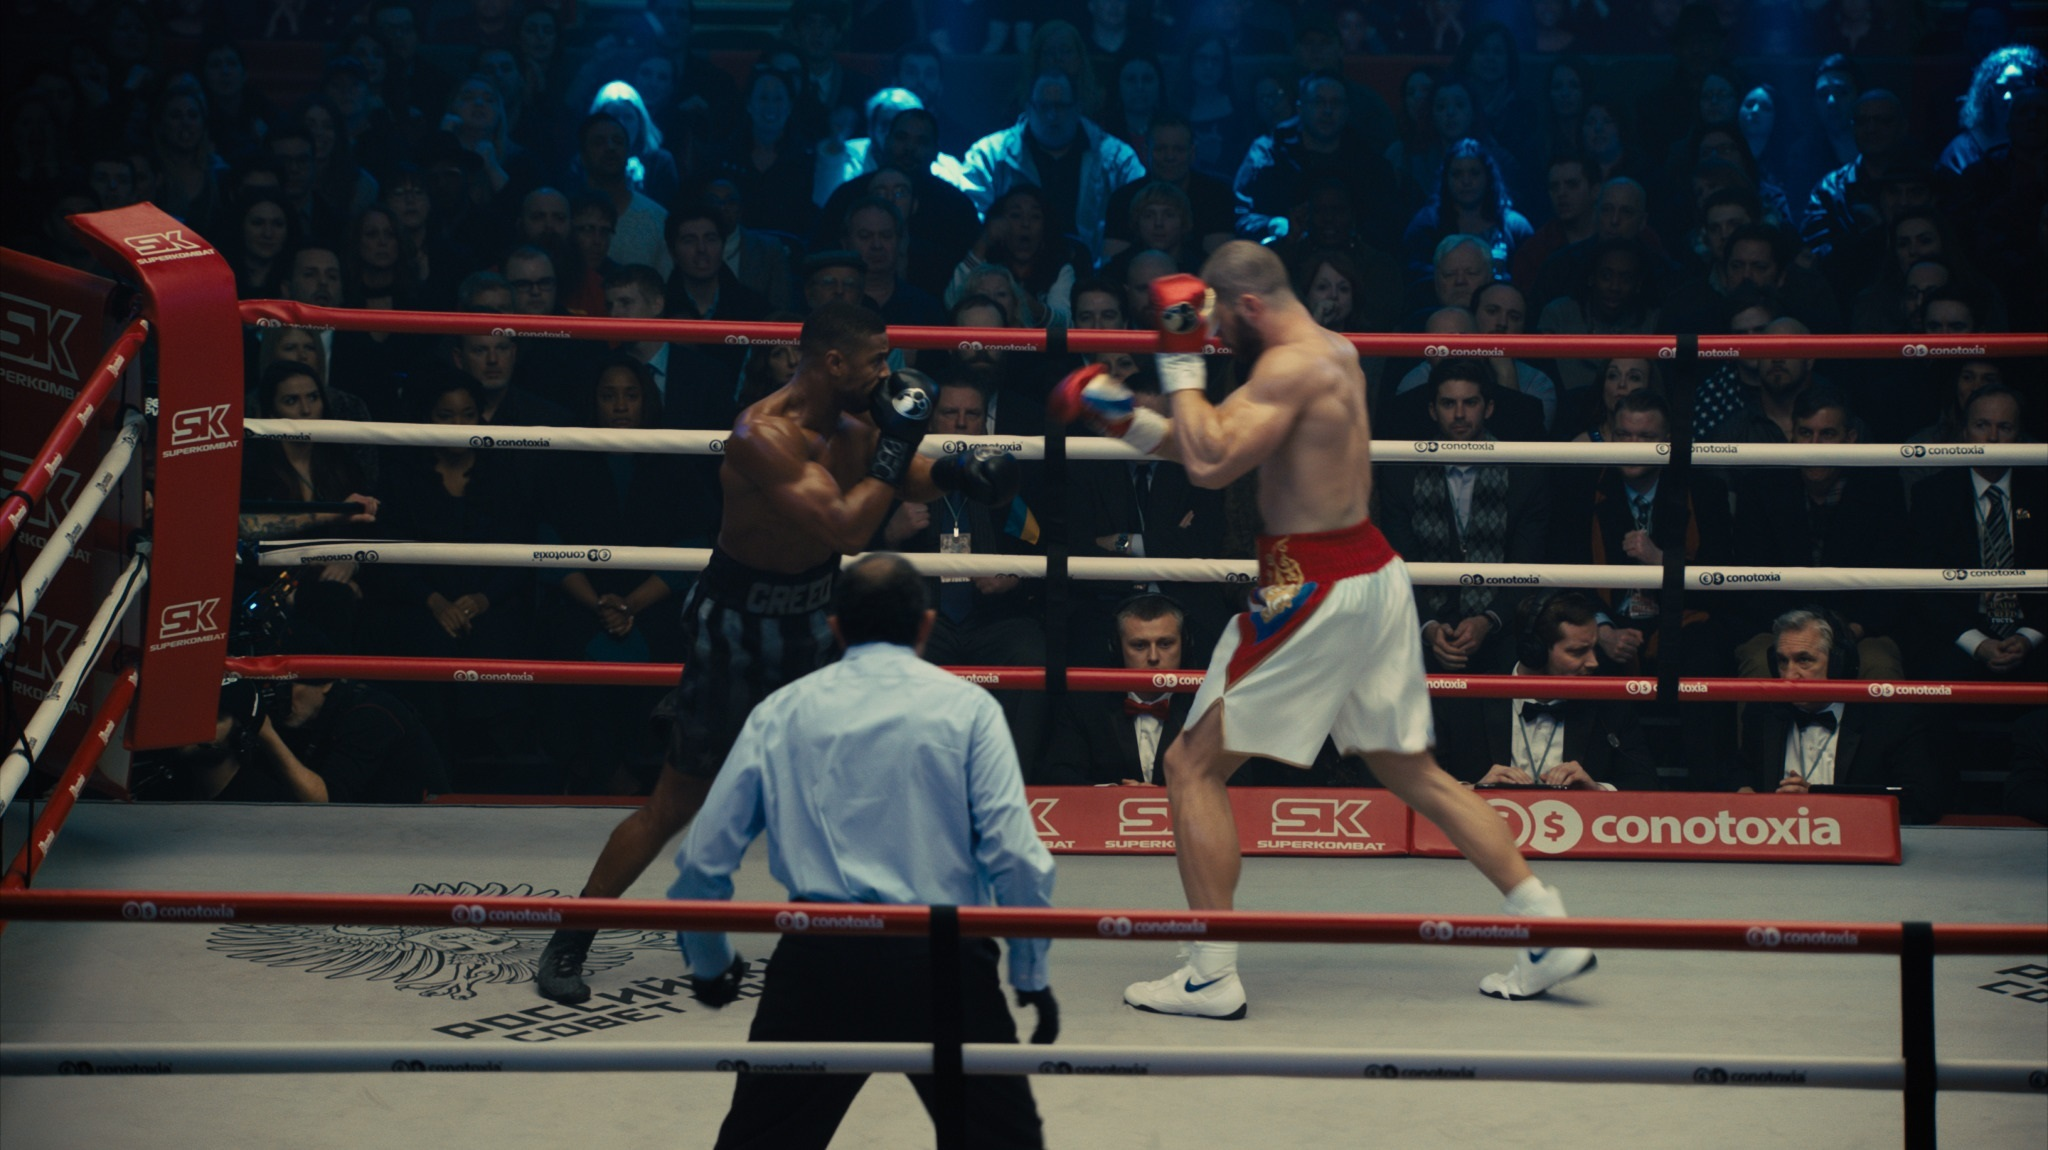 Michael B. Jordan and Florian Munteanu in Creed II (2018)